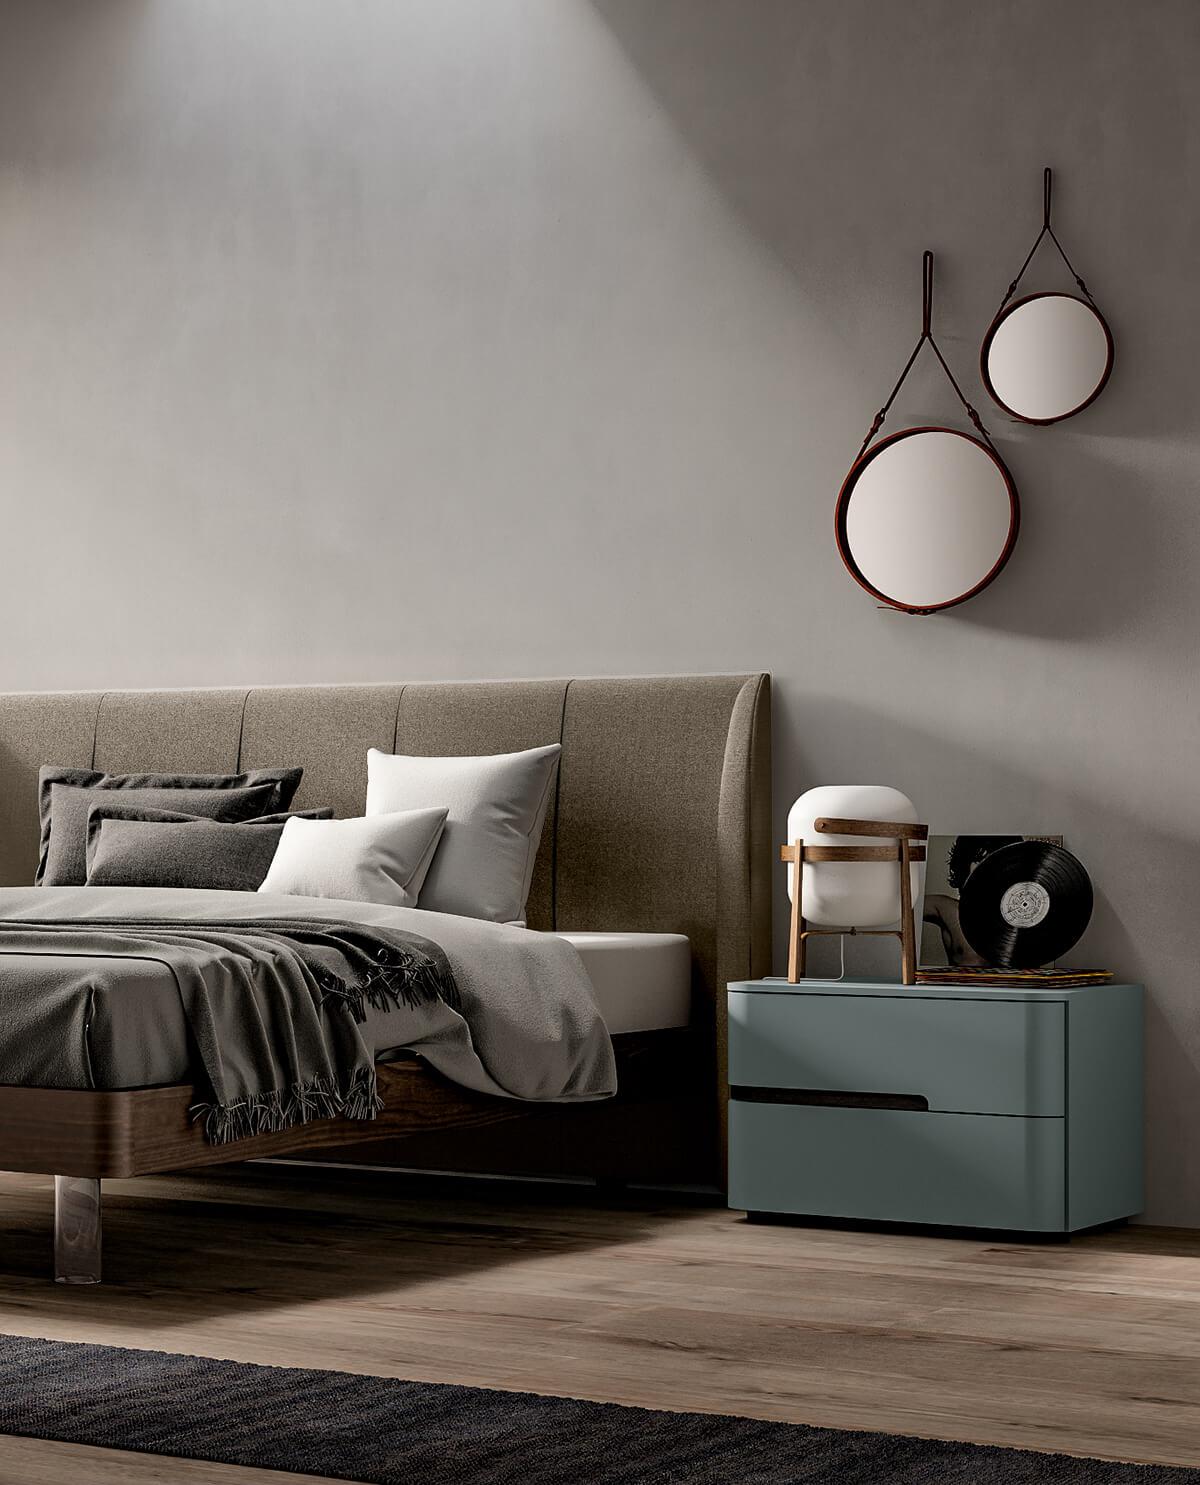 Small bedroom lighting designs 8